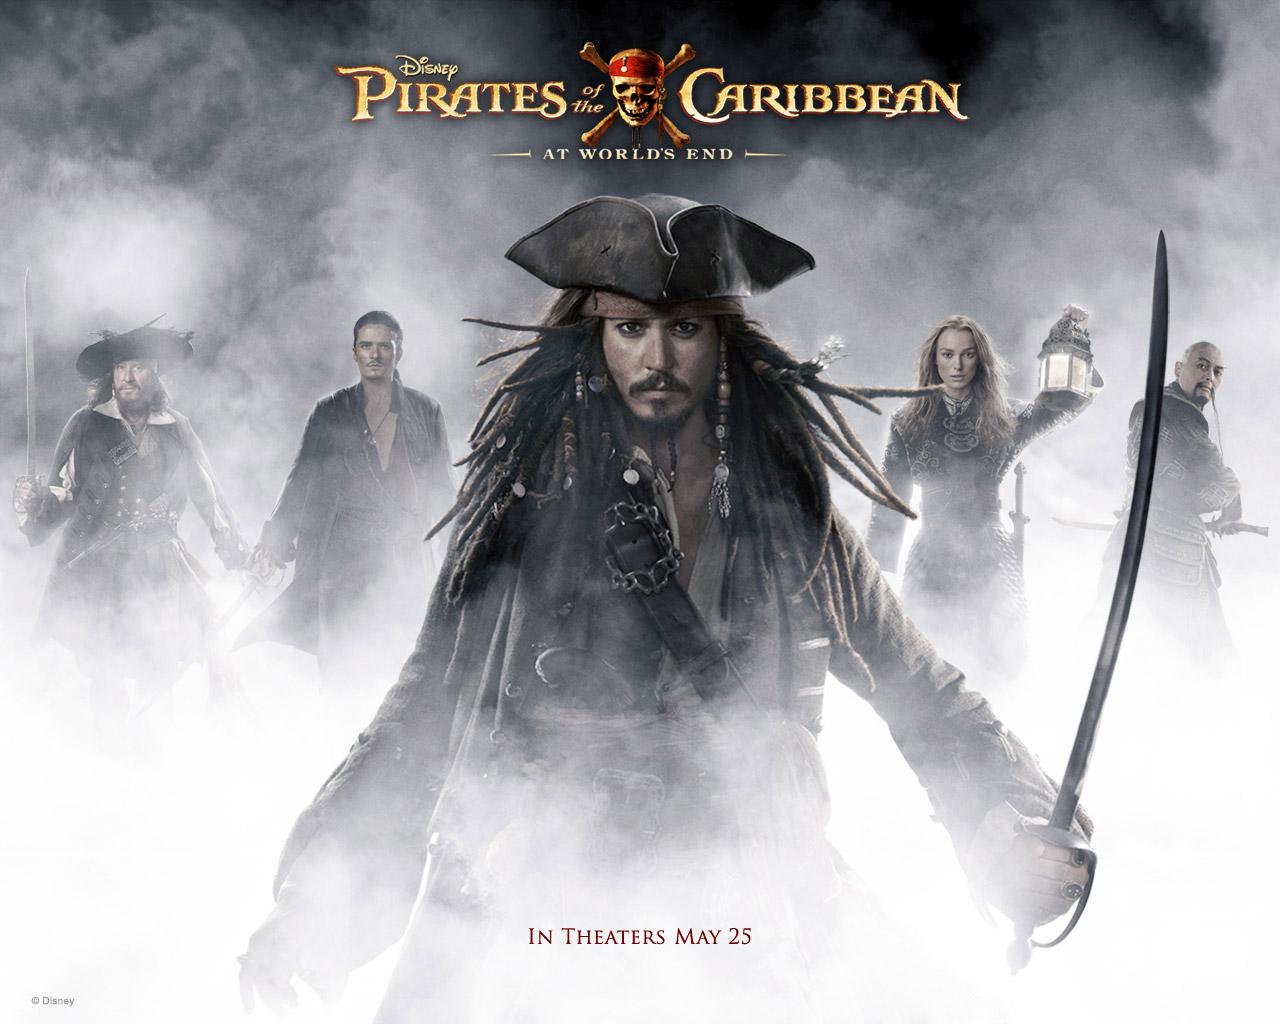 Pirates of the caribbean wallpapers, desktop wallpaper free ...